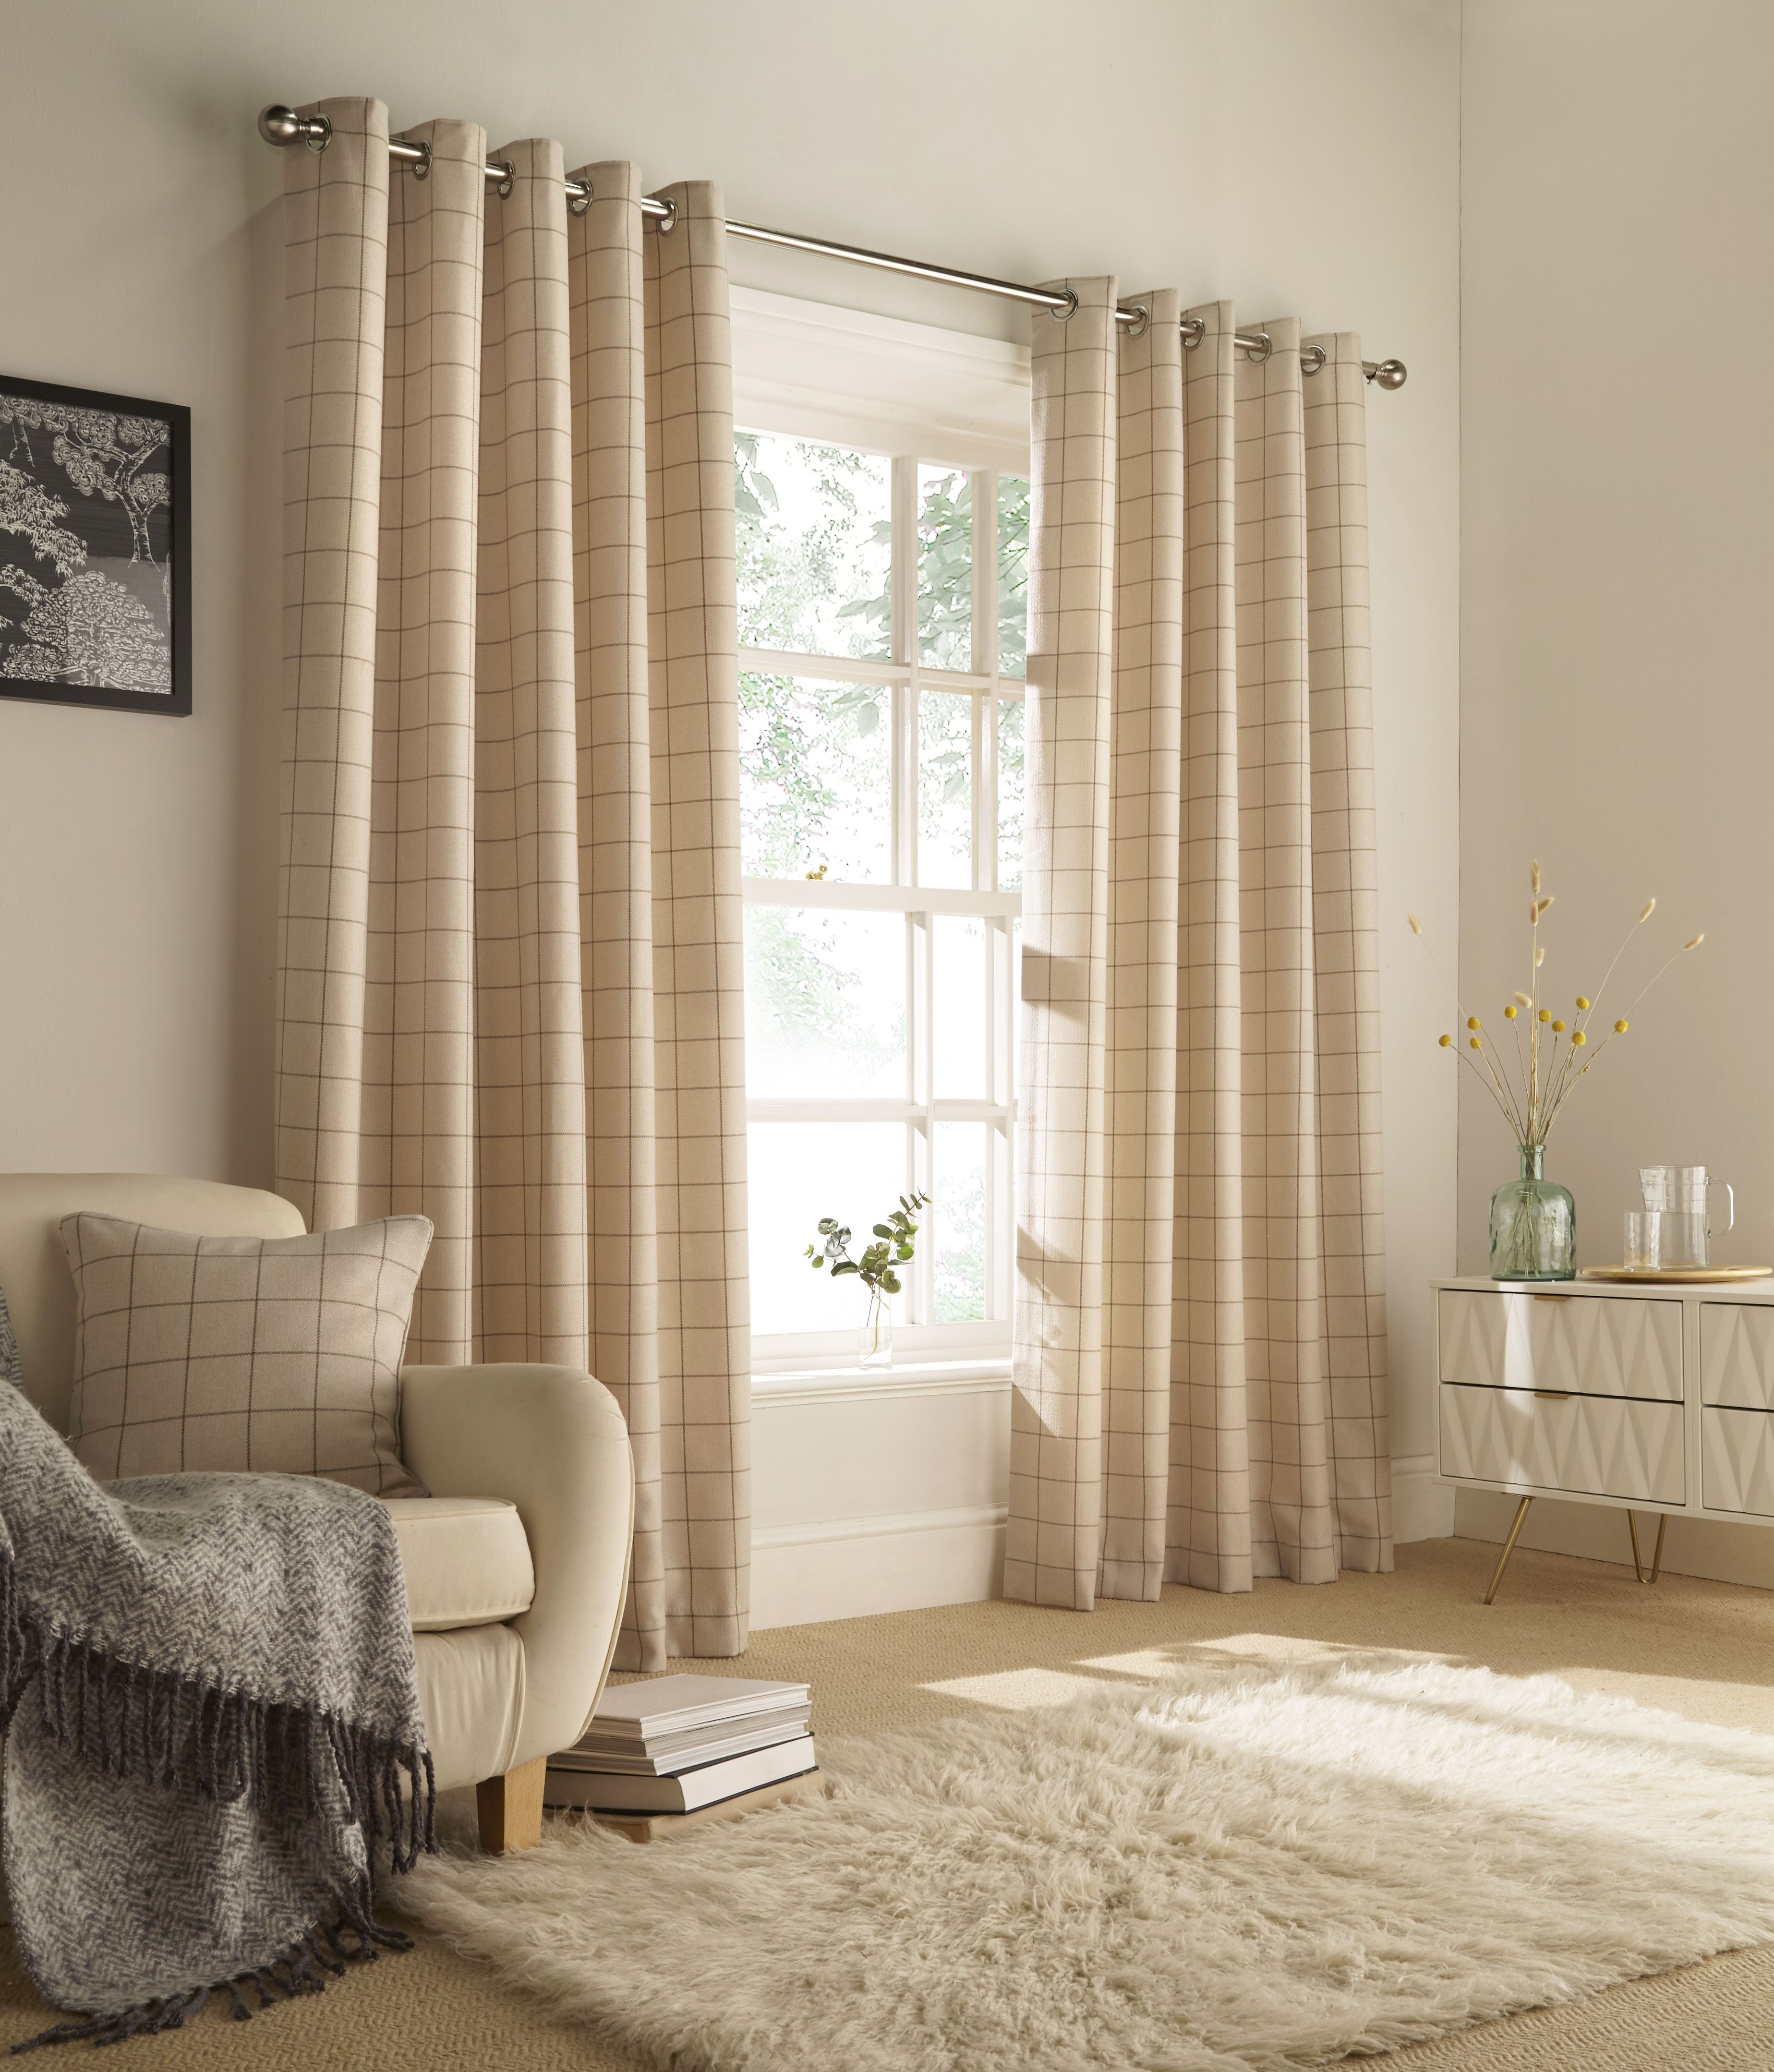 Ellis Windowpane Check Eyelet Curtains in Natural